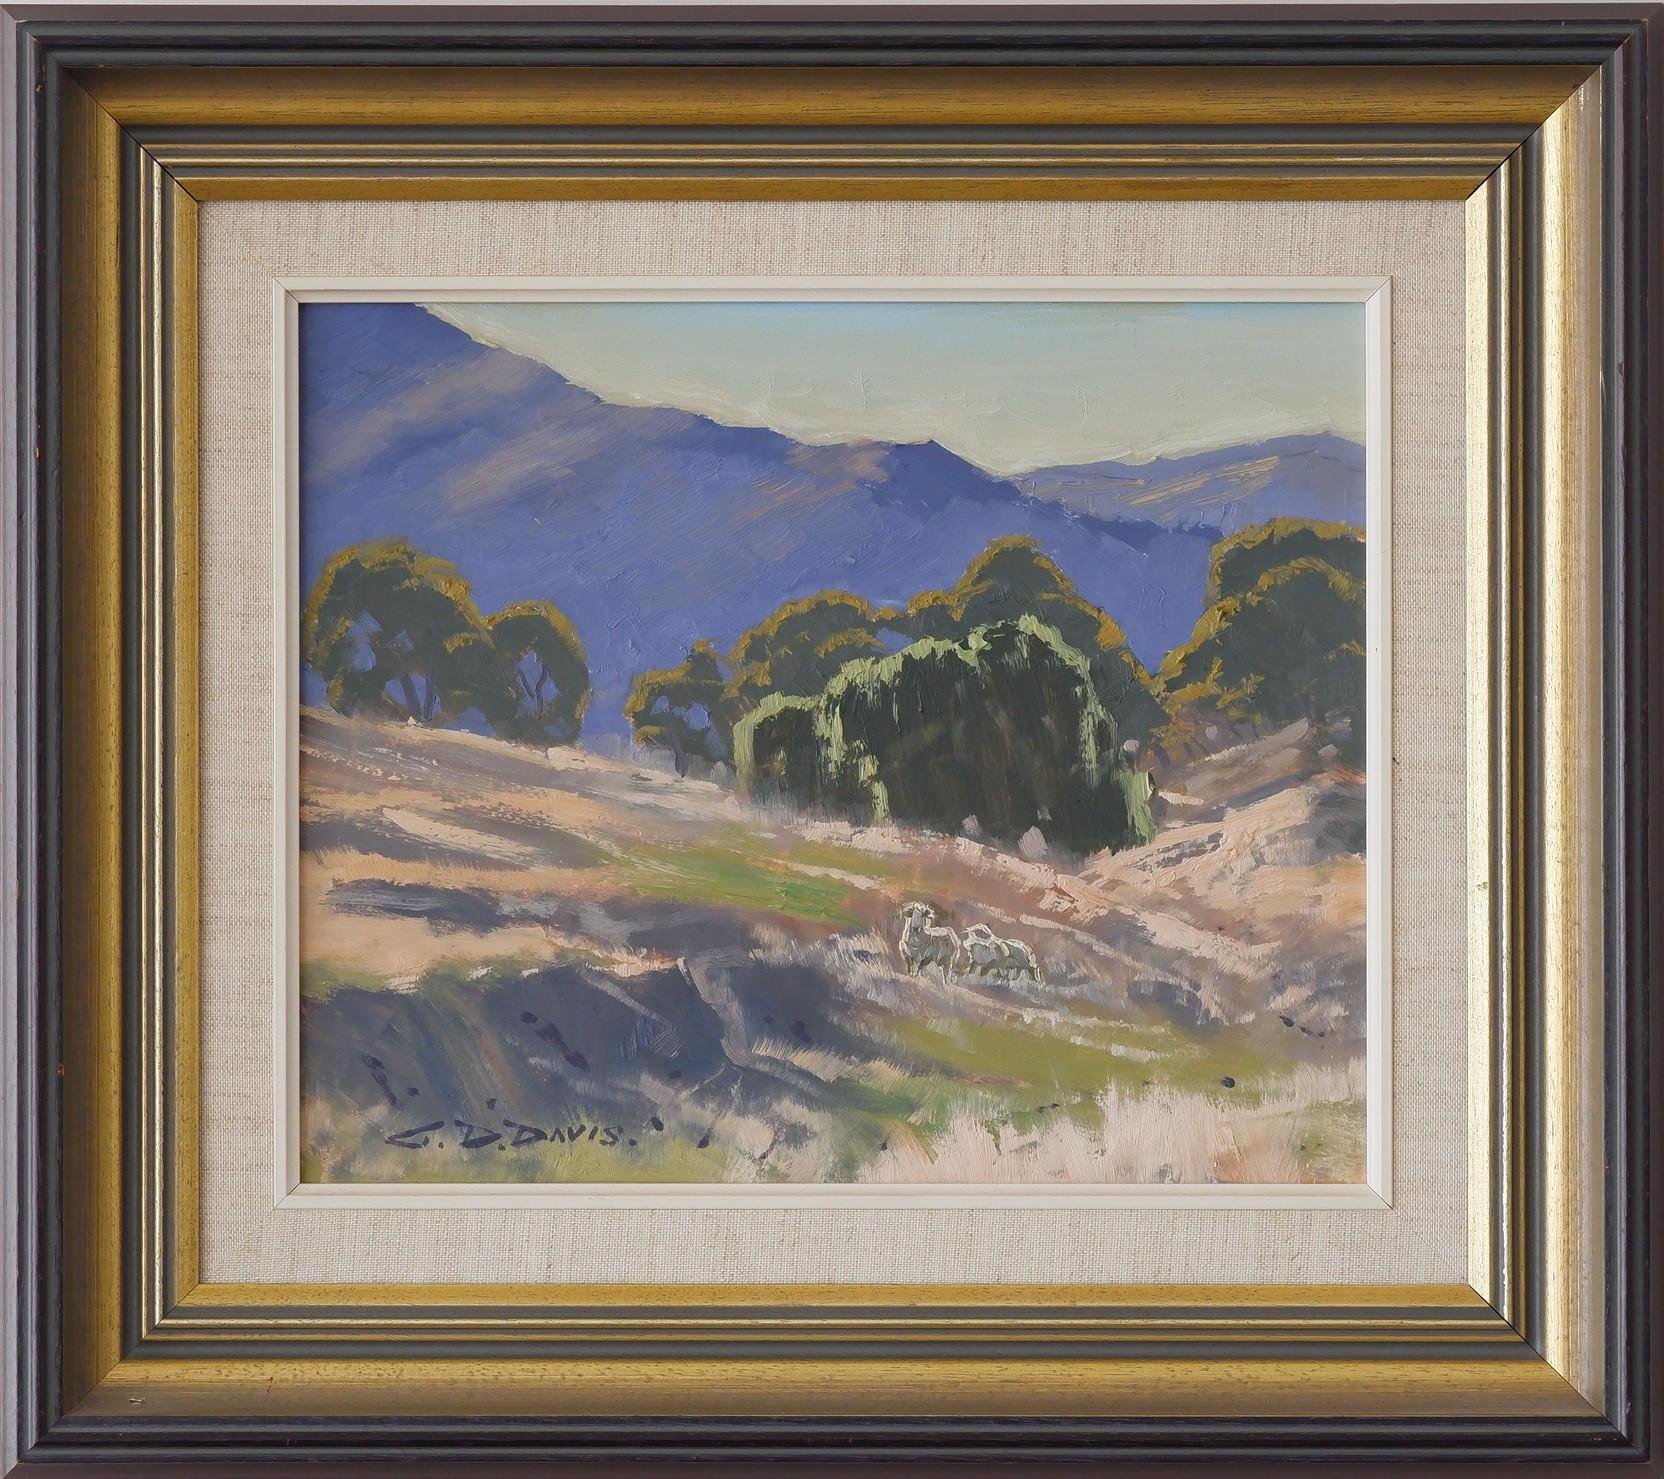 'Geoffrey Davis (1926-) Monaro Pastoral Scene Oil on Board'